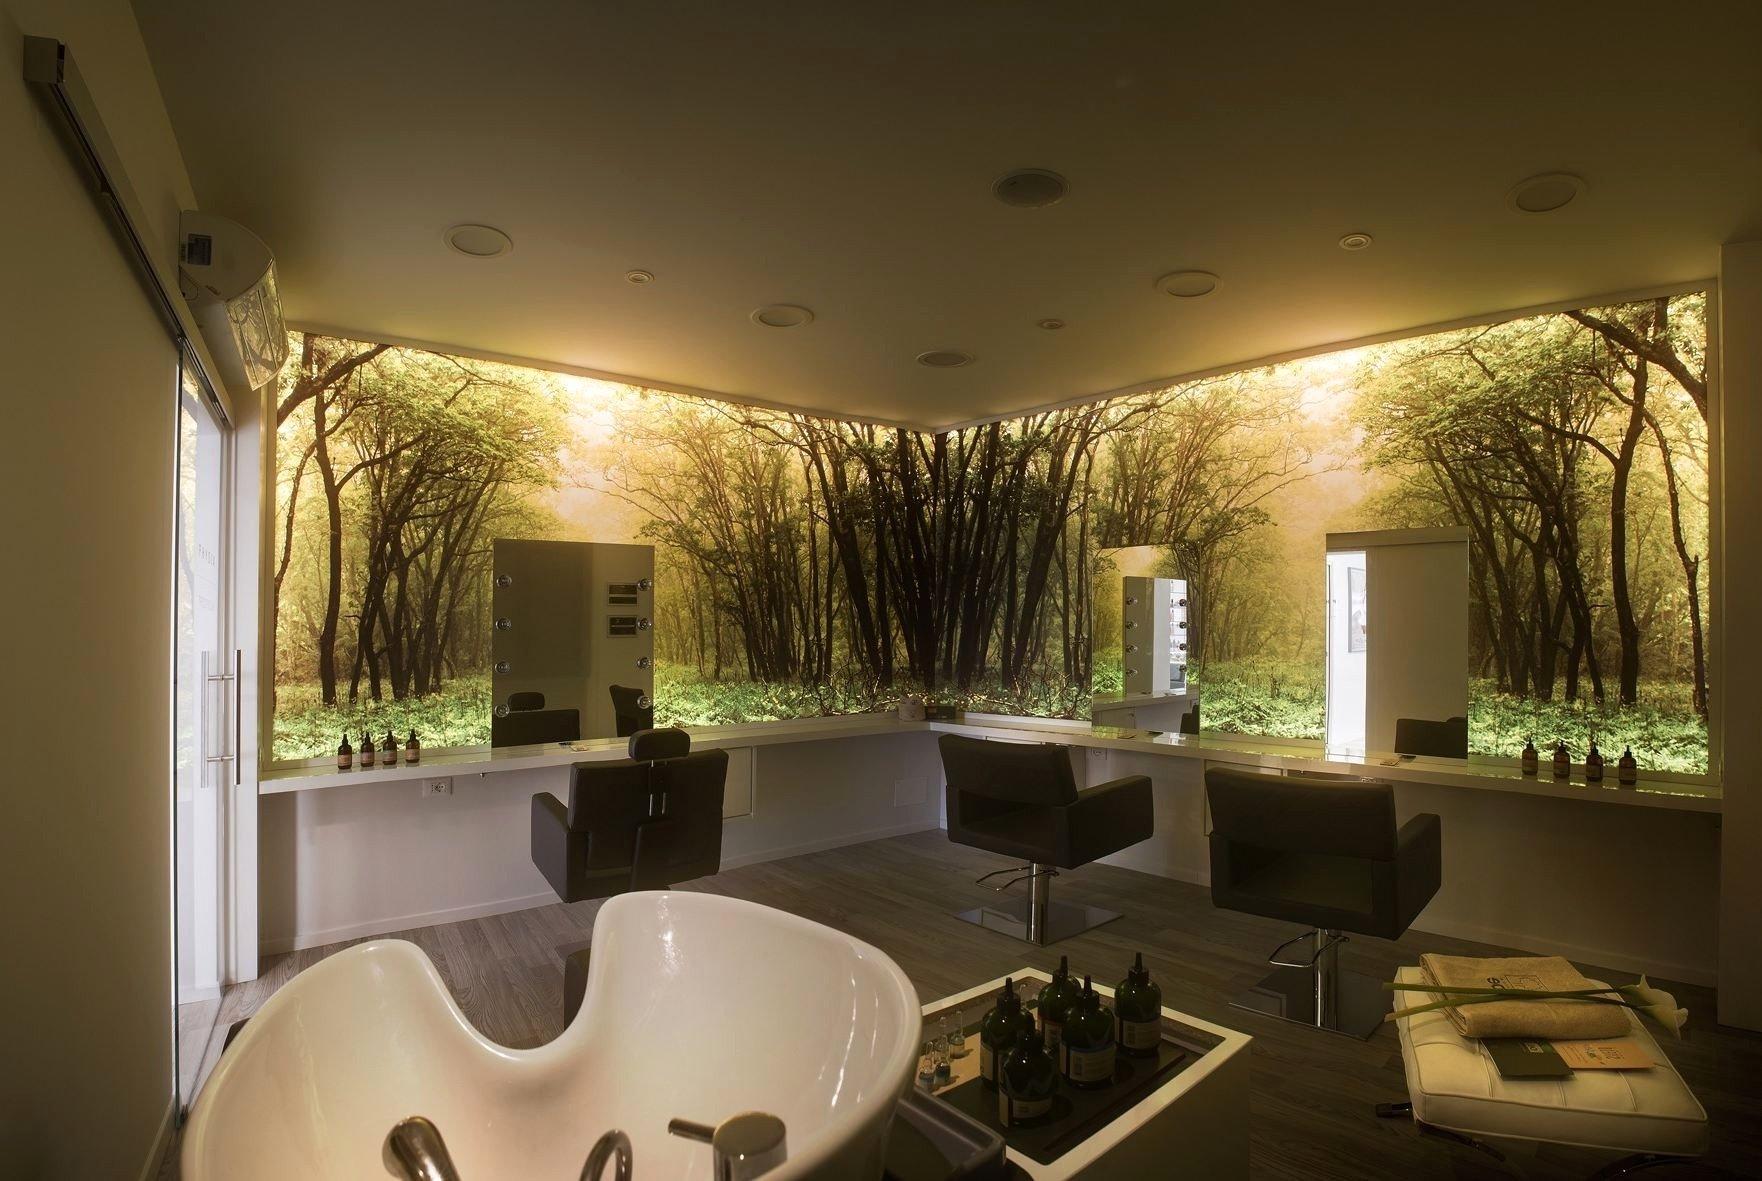 10 Ideal Nail Salon Interior Design Ideas modern barber shop designs small nail salon design ideas hair avec 2020